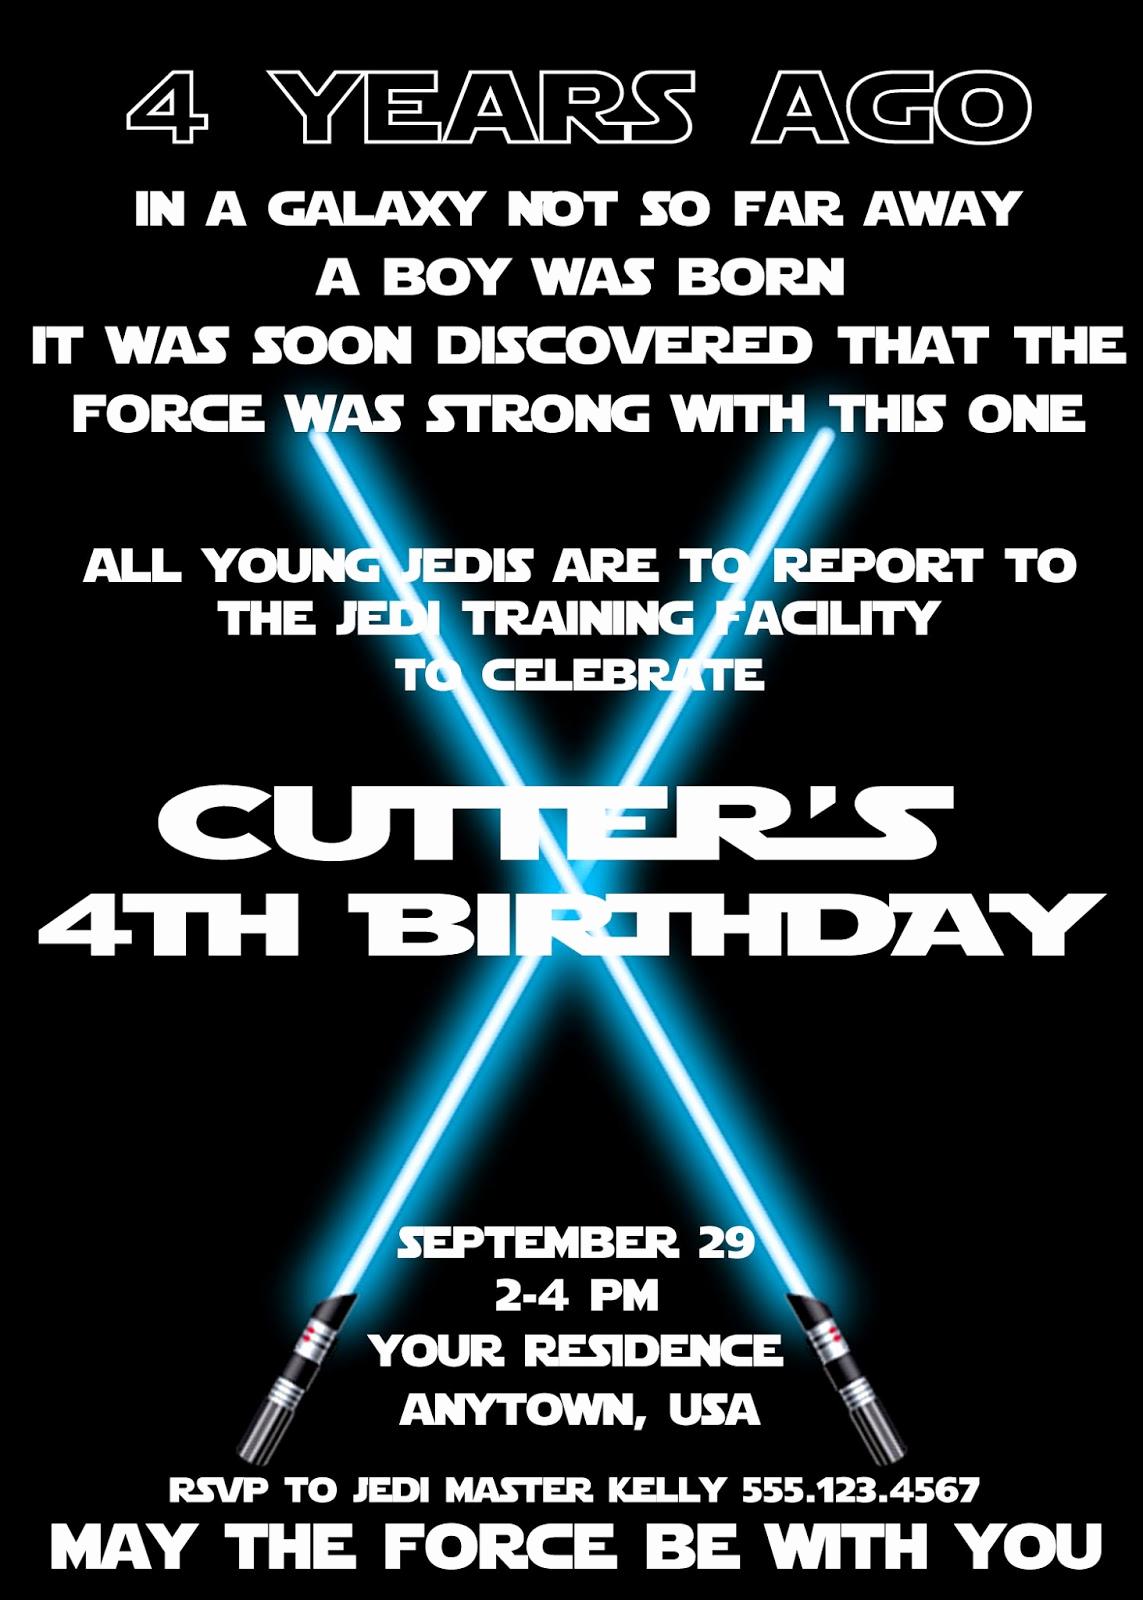 Star Wars Birthday Invitations Beautiful Plan An Amazing Star Wars Birthday Party